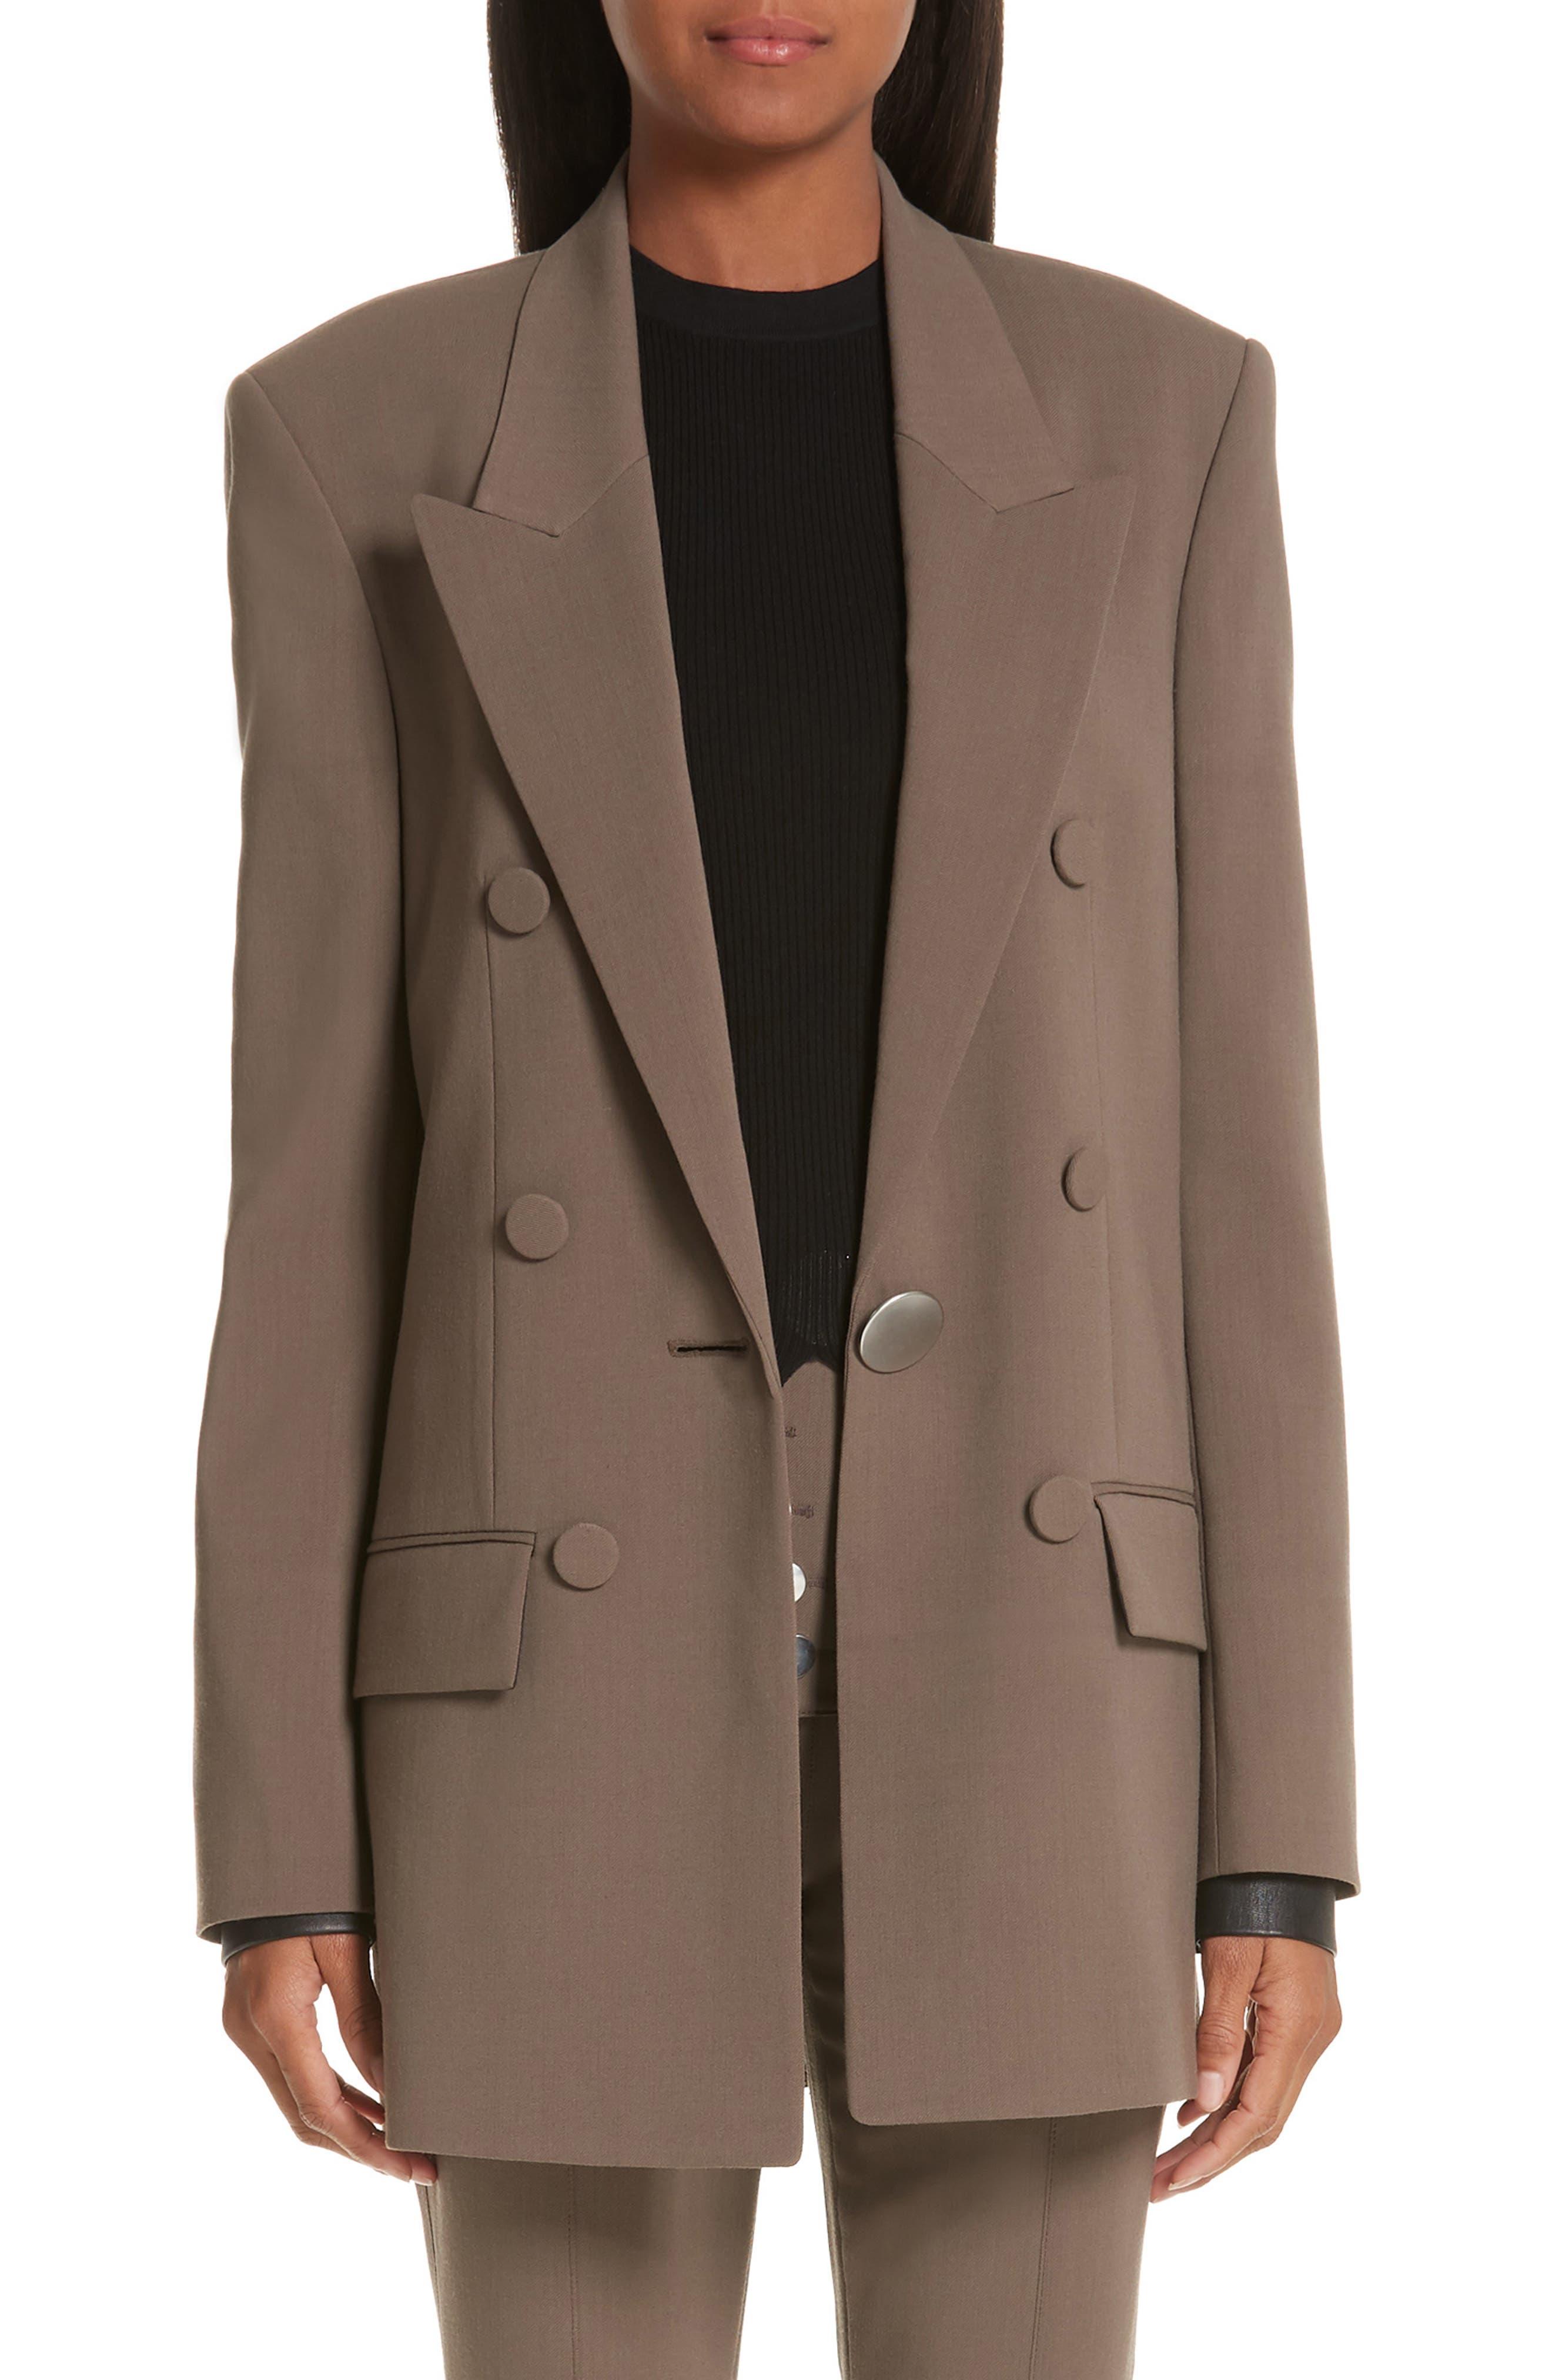 ALEXANDER WANG Leather Cuff Blazer, Main, color, KHAKI GREEN